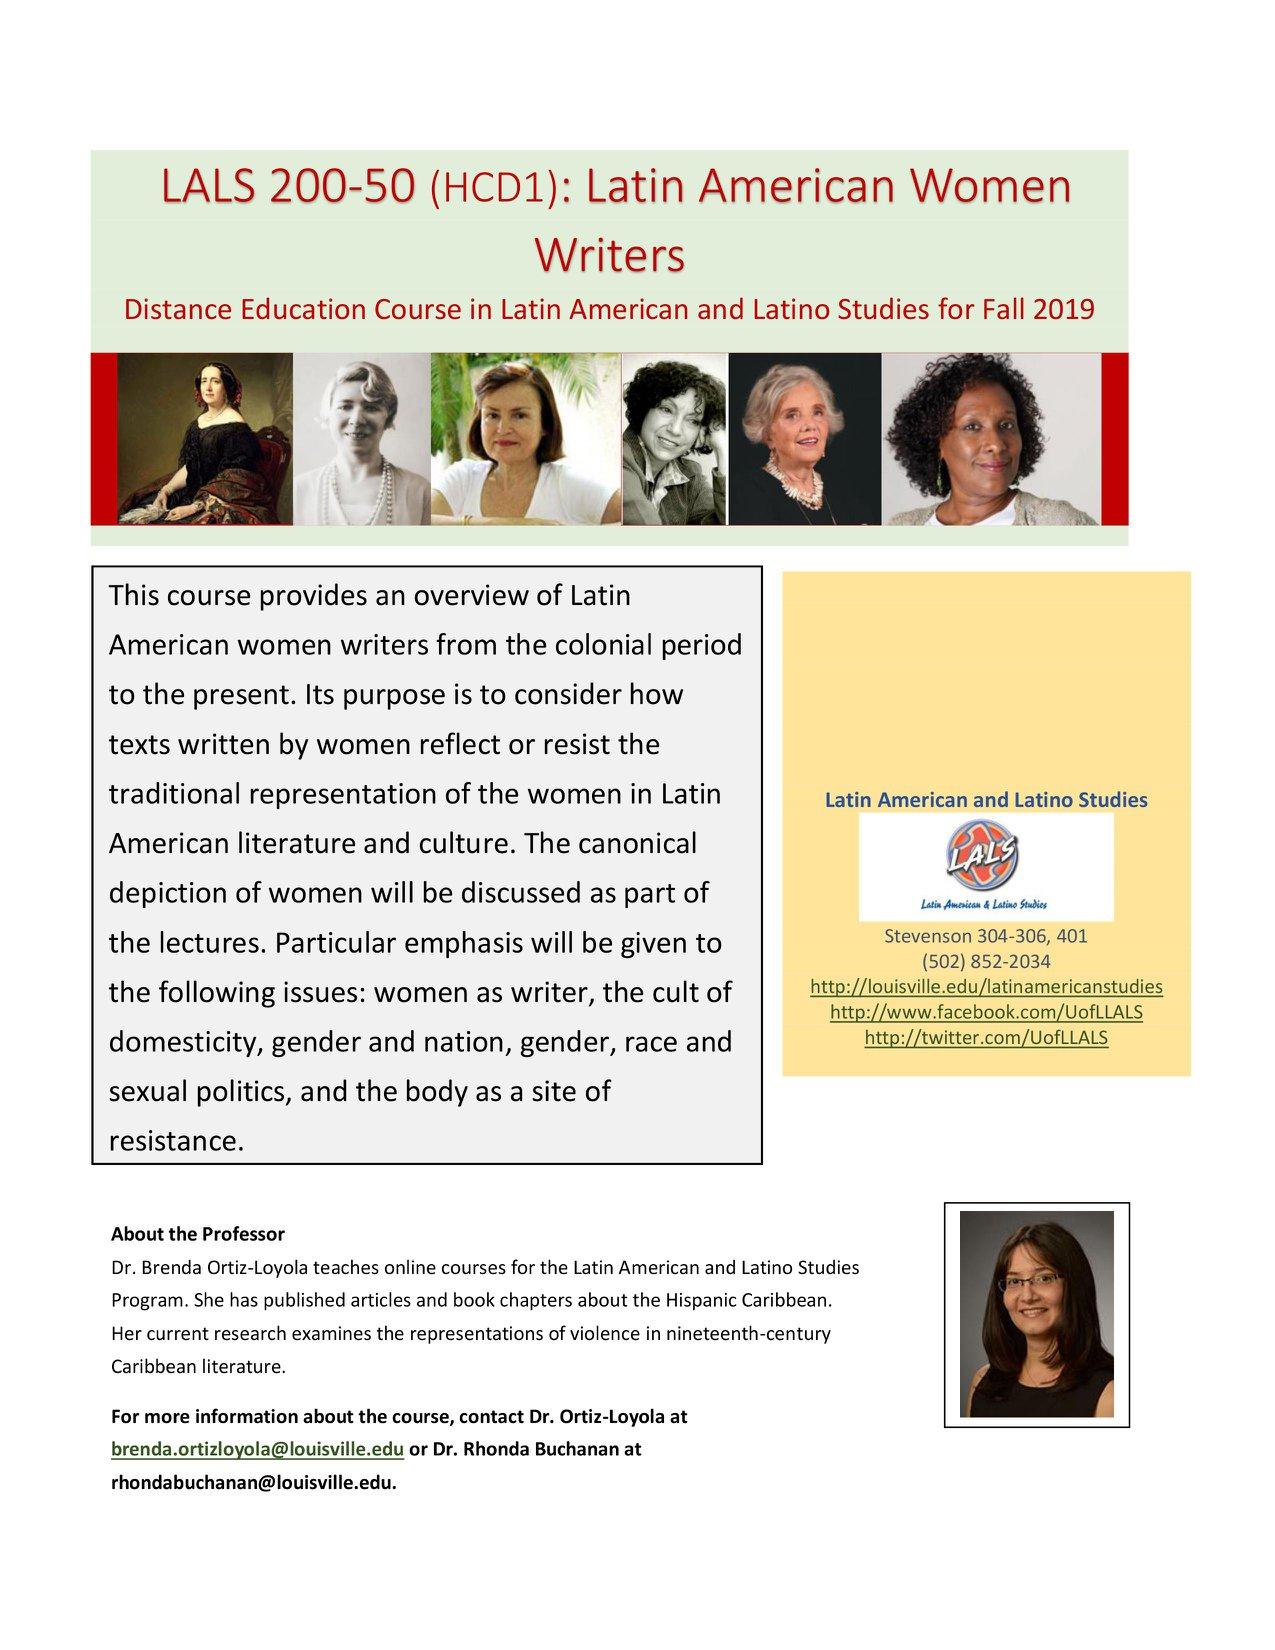 LALS 200 - Latin American Women Writers